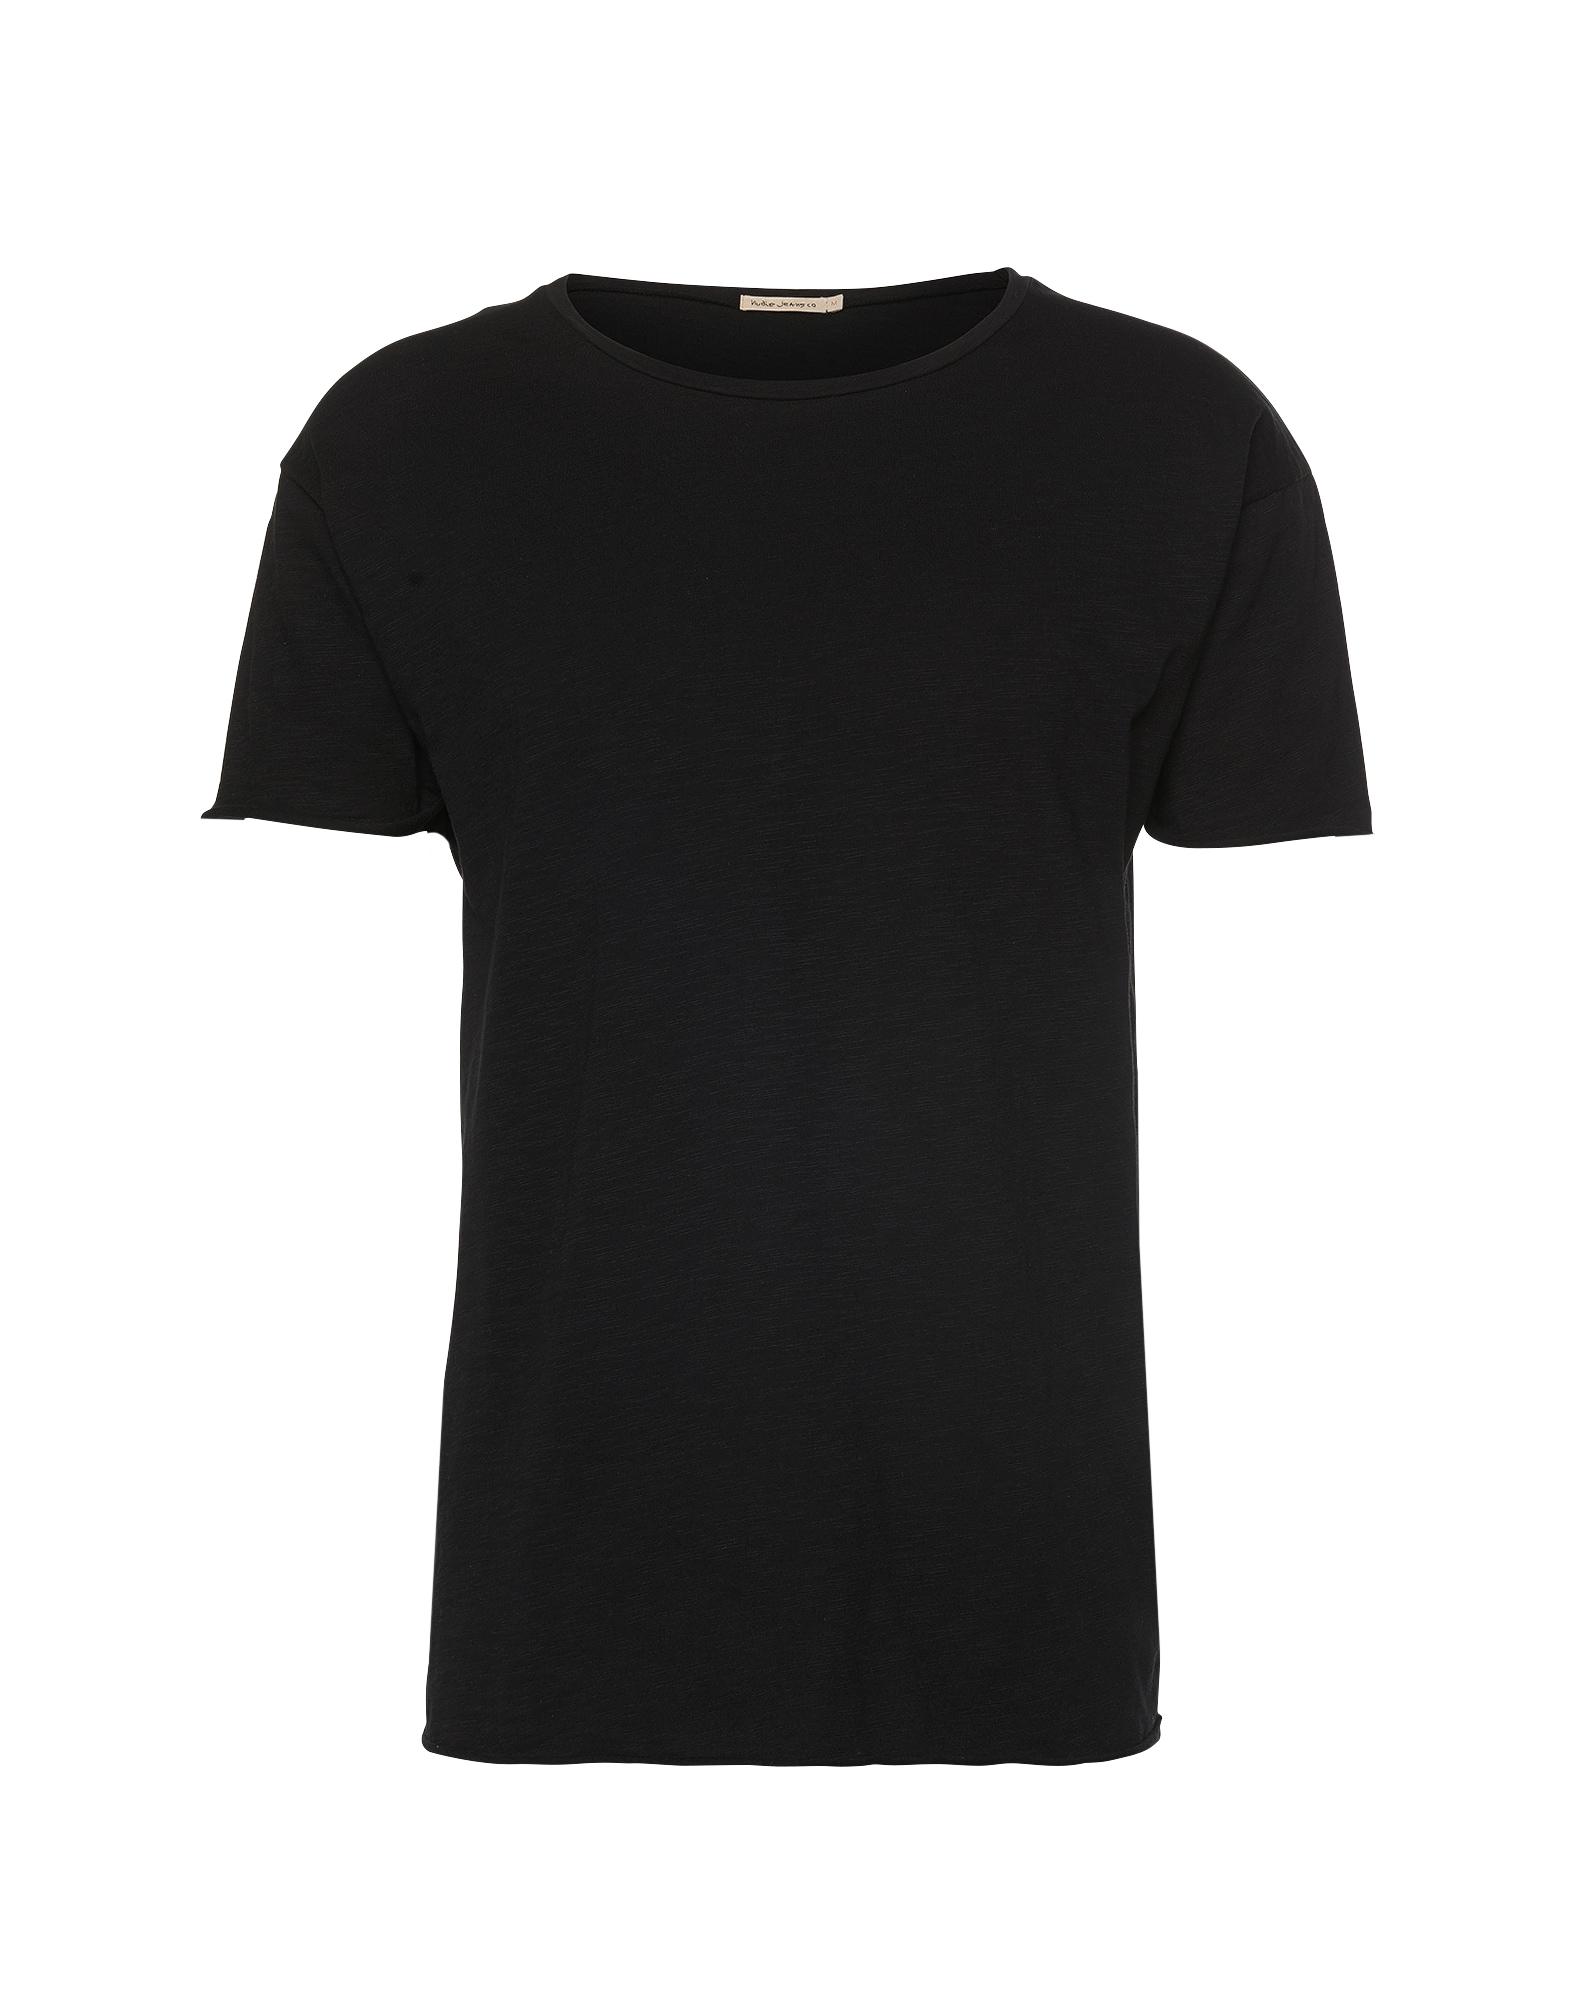 Nudie Jeans Co Tričko 'Roger Slub'  čierna